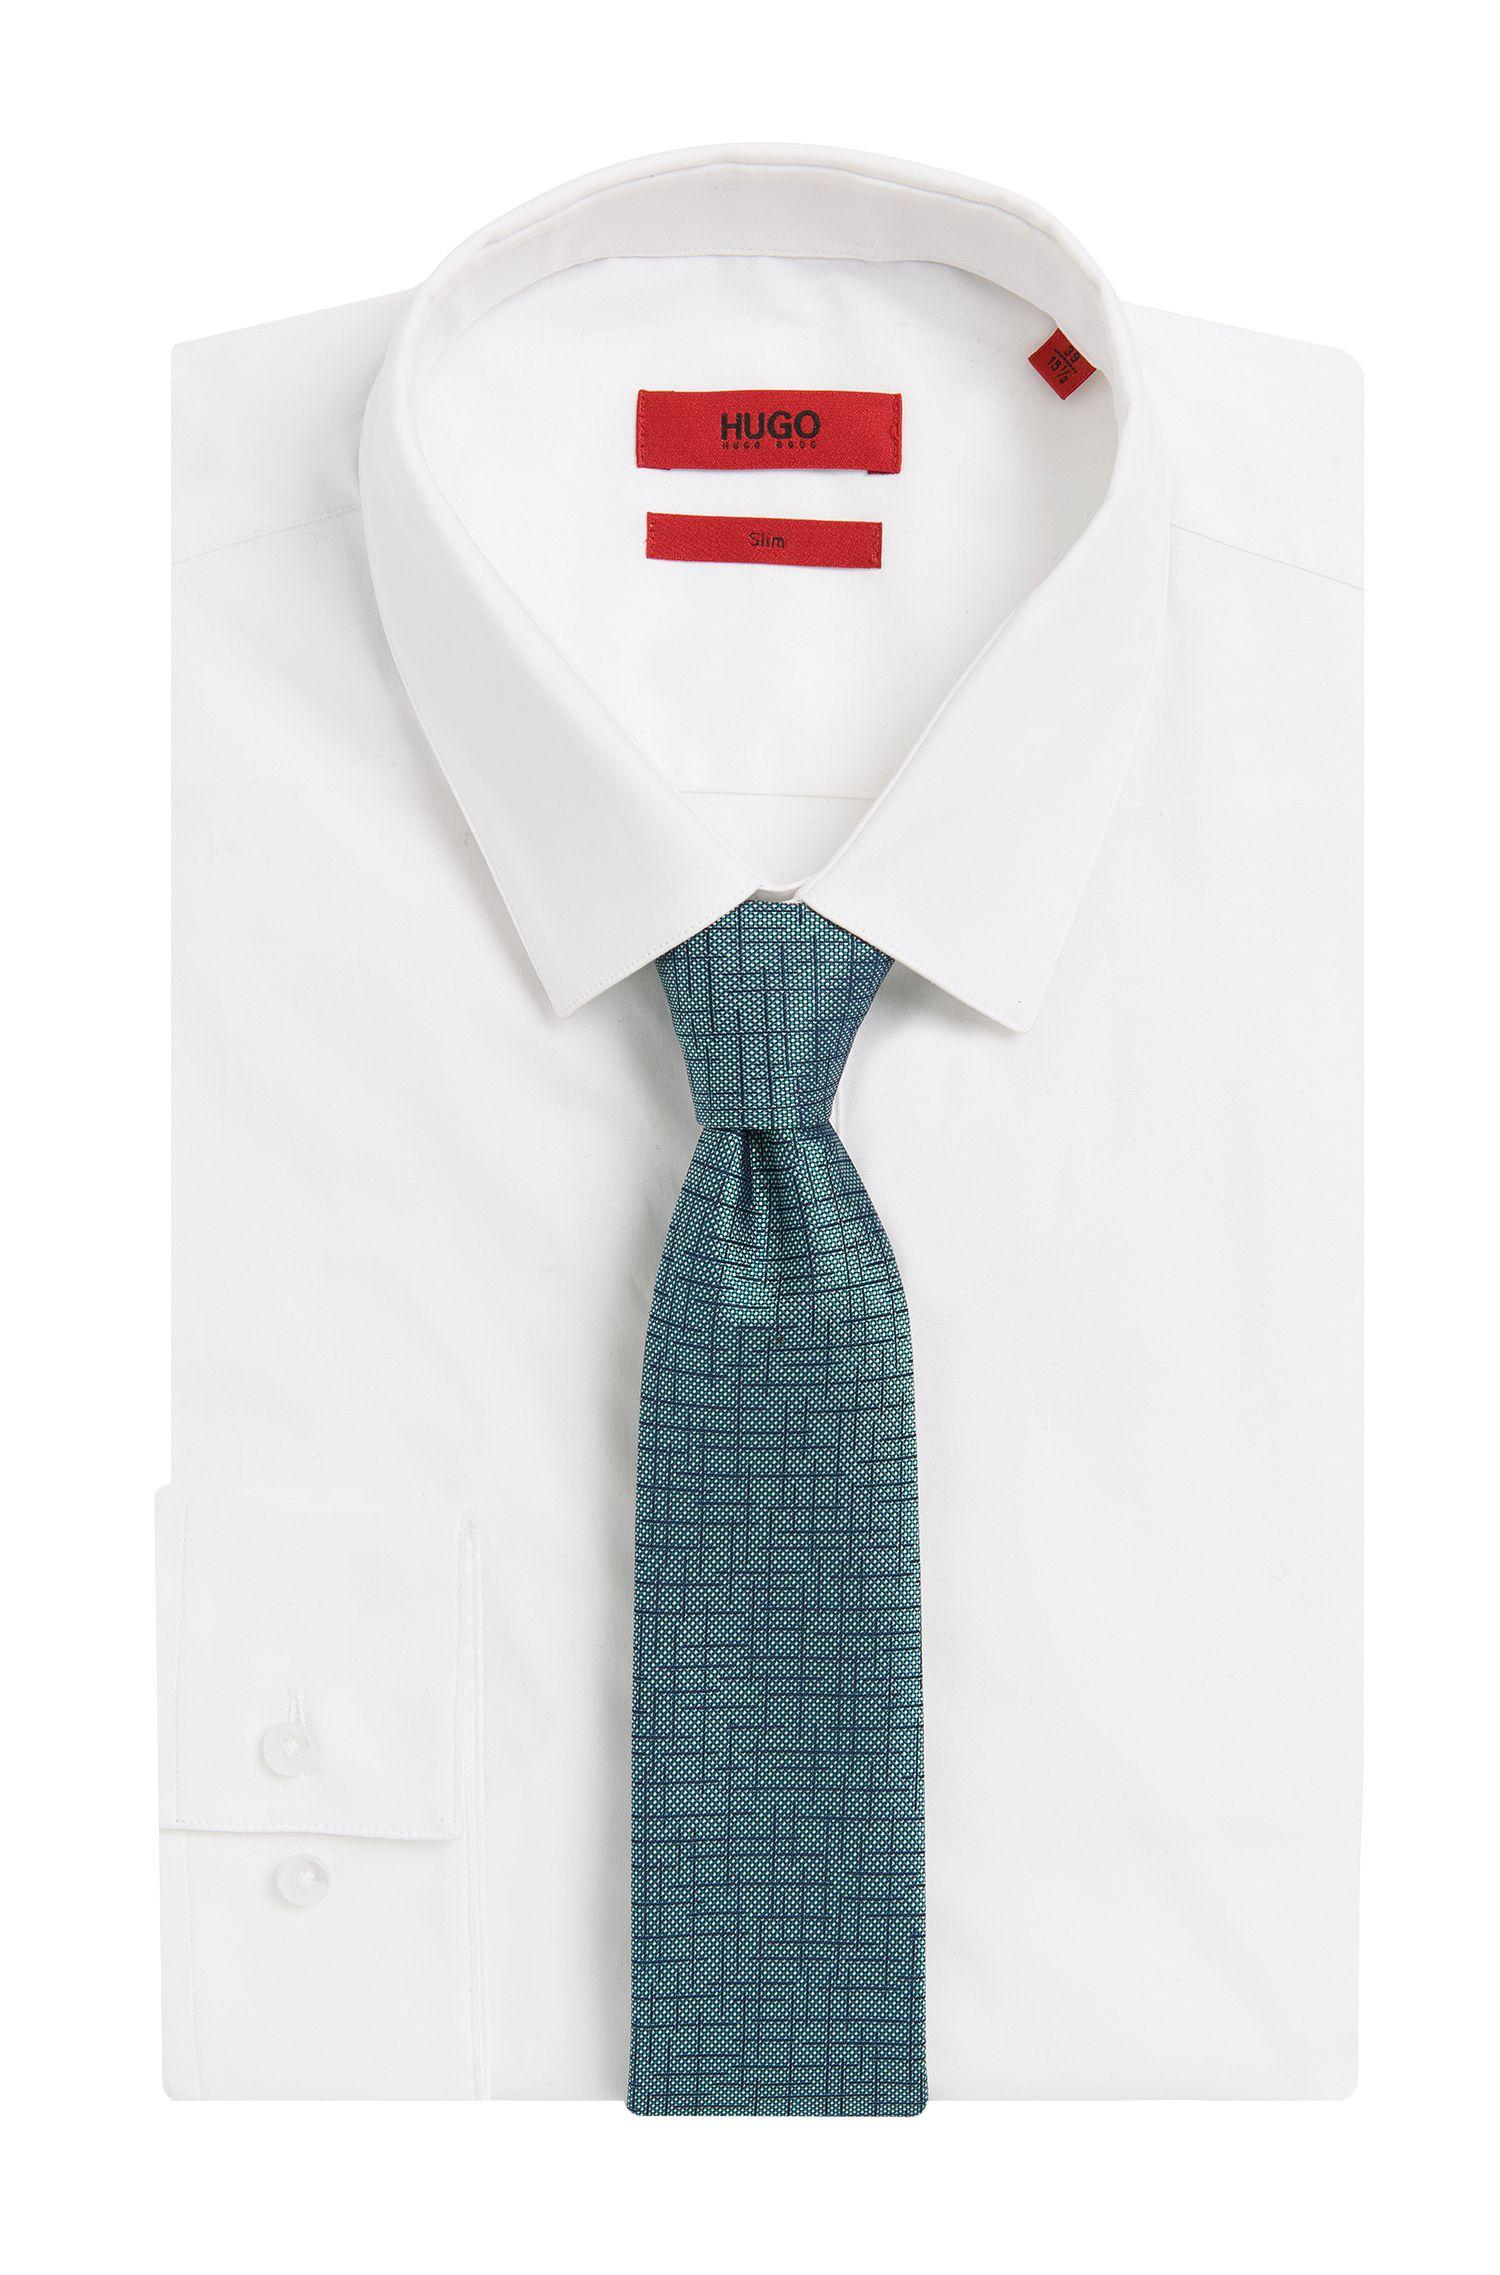 Gemusterte Krawatte aus Seide: 'Tie cm 6'